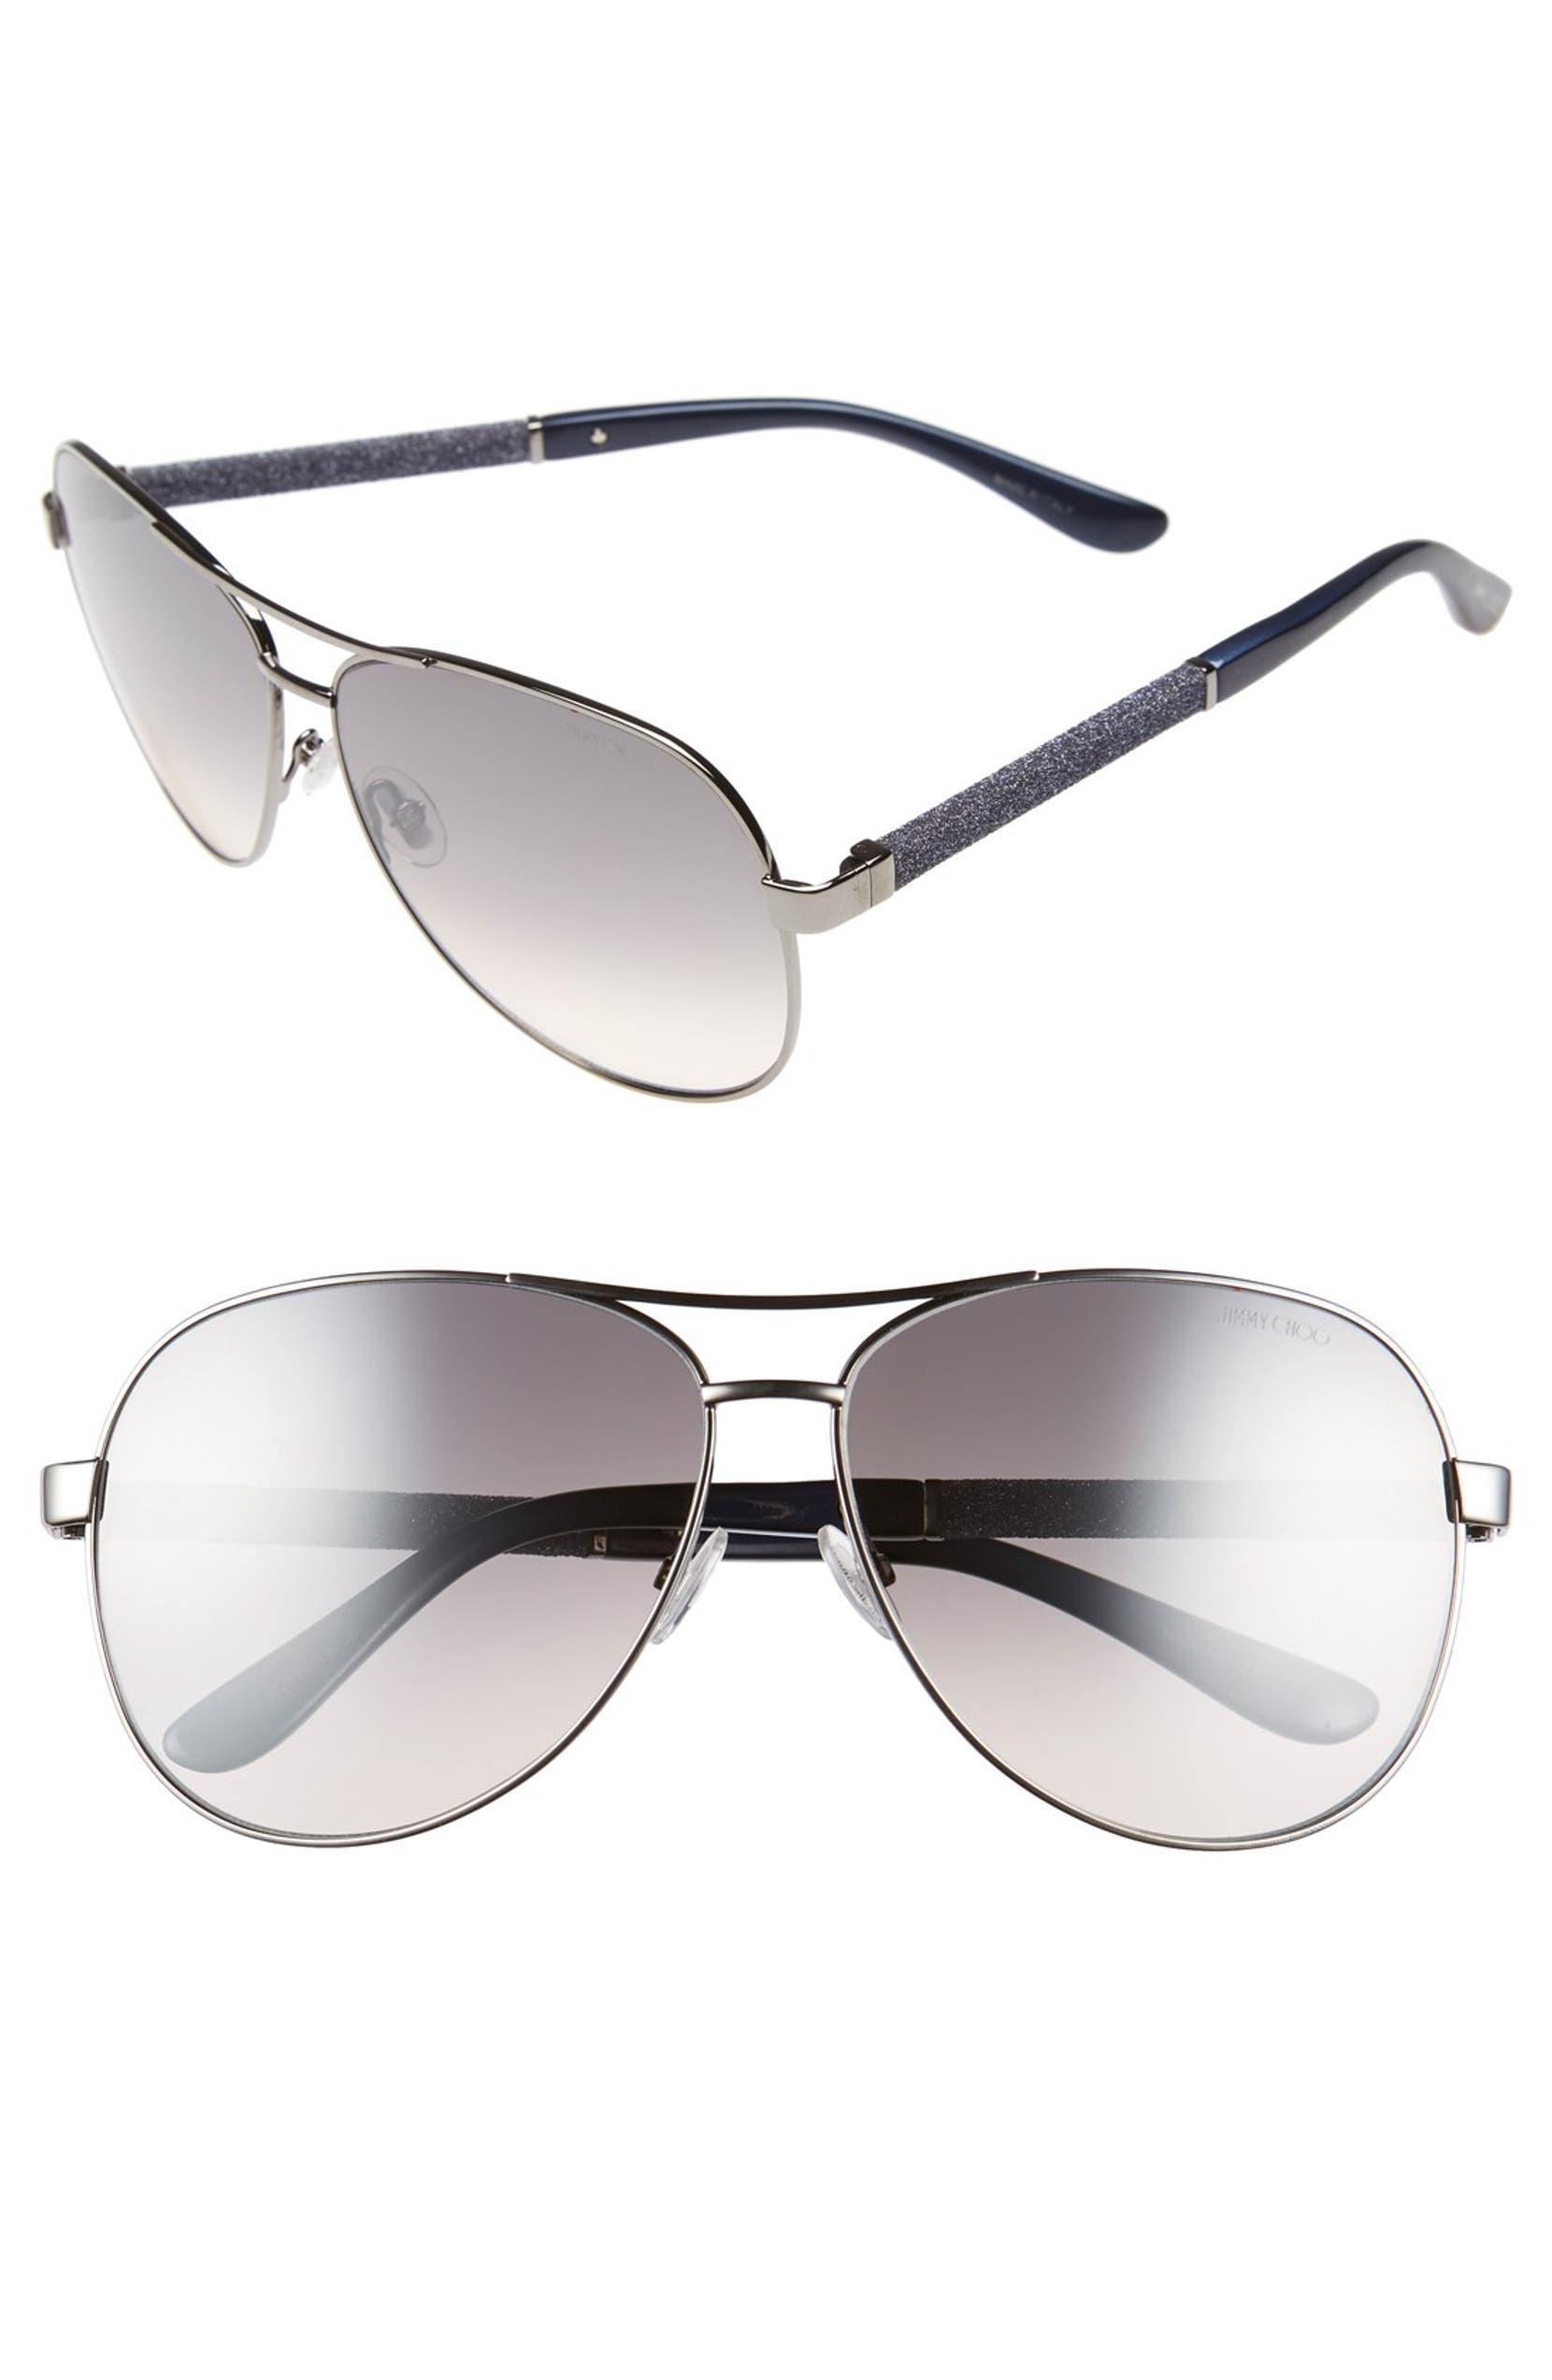 214353e7ad2 Jimmy Choo  Lexie  61mm Aviator Sunglasses